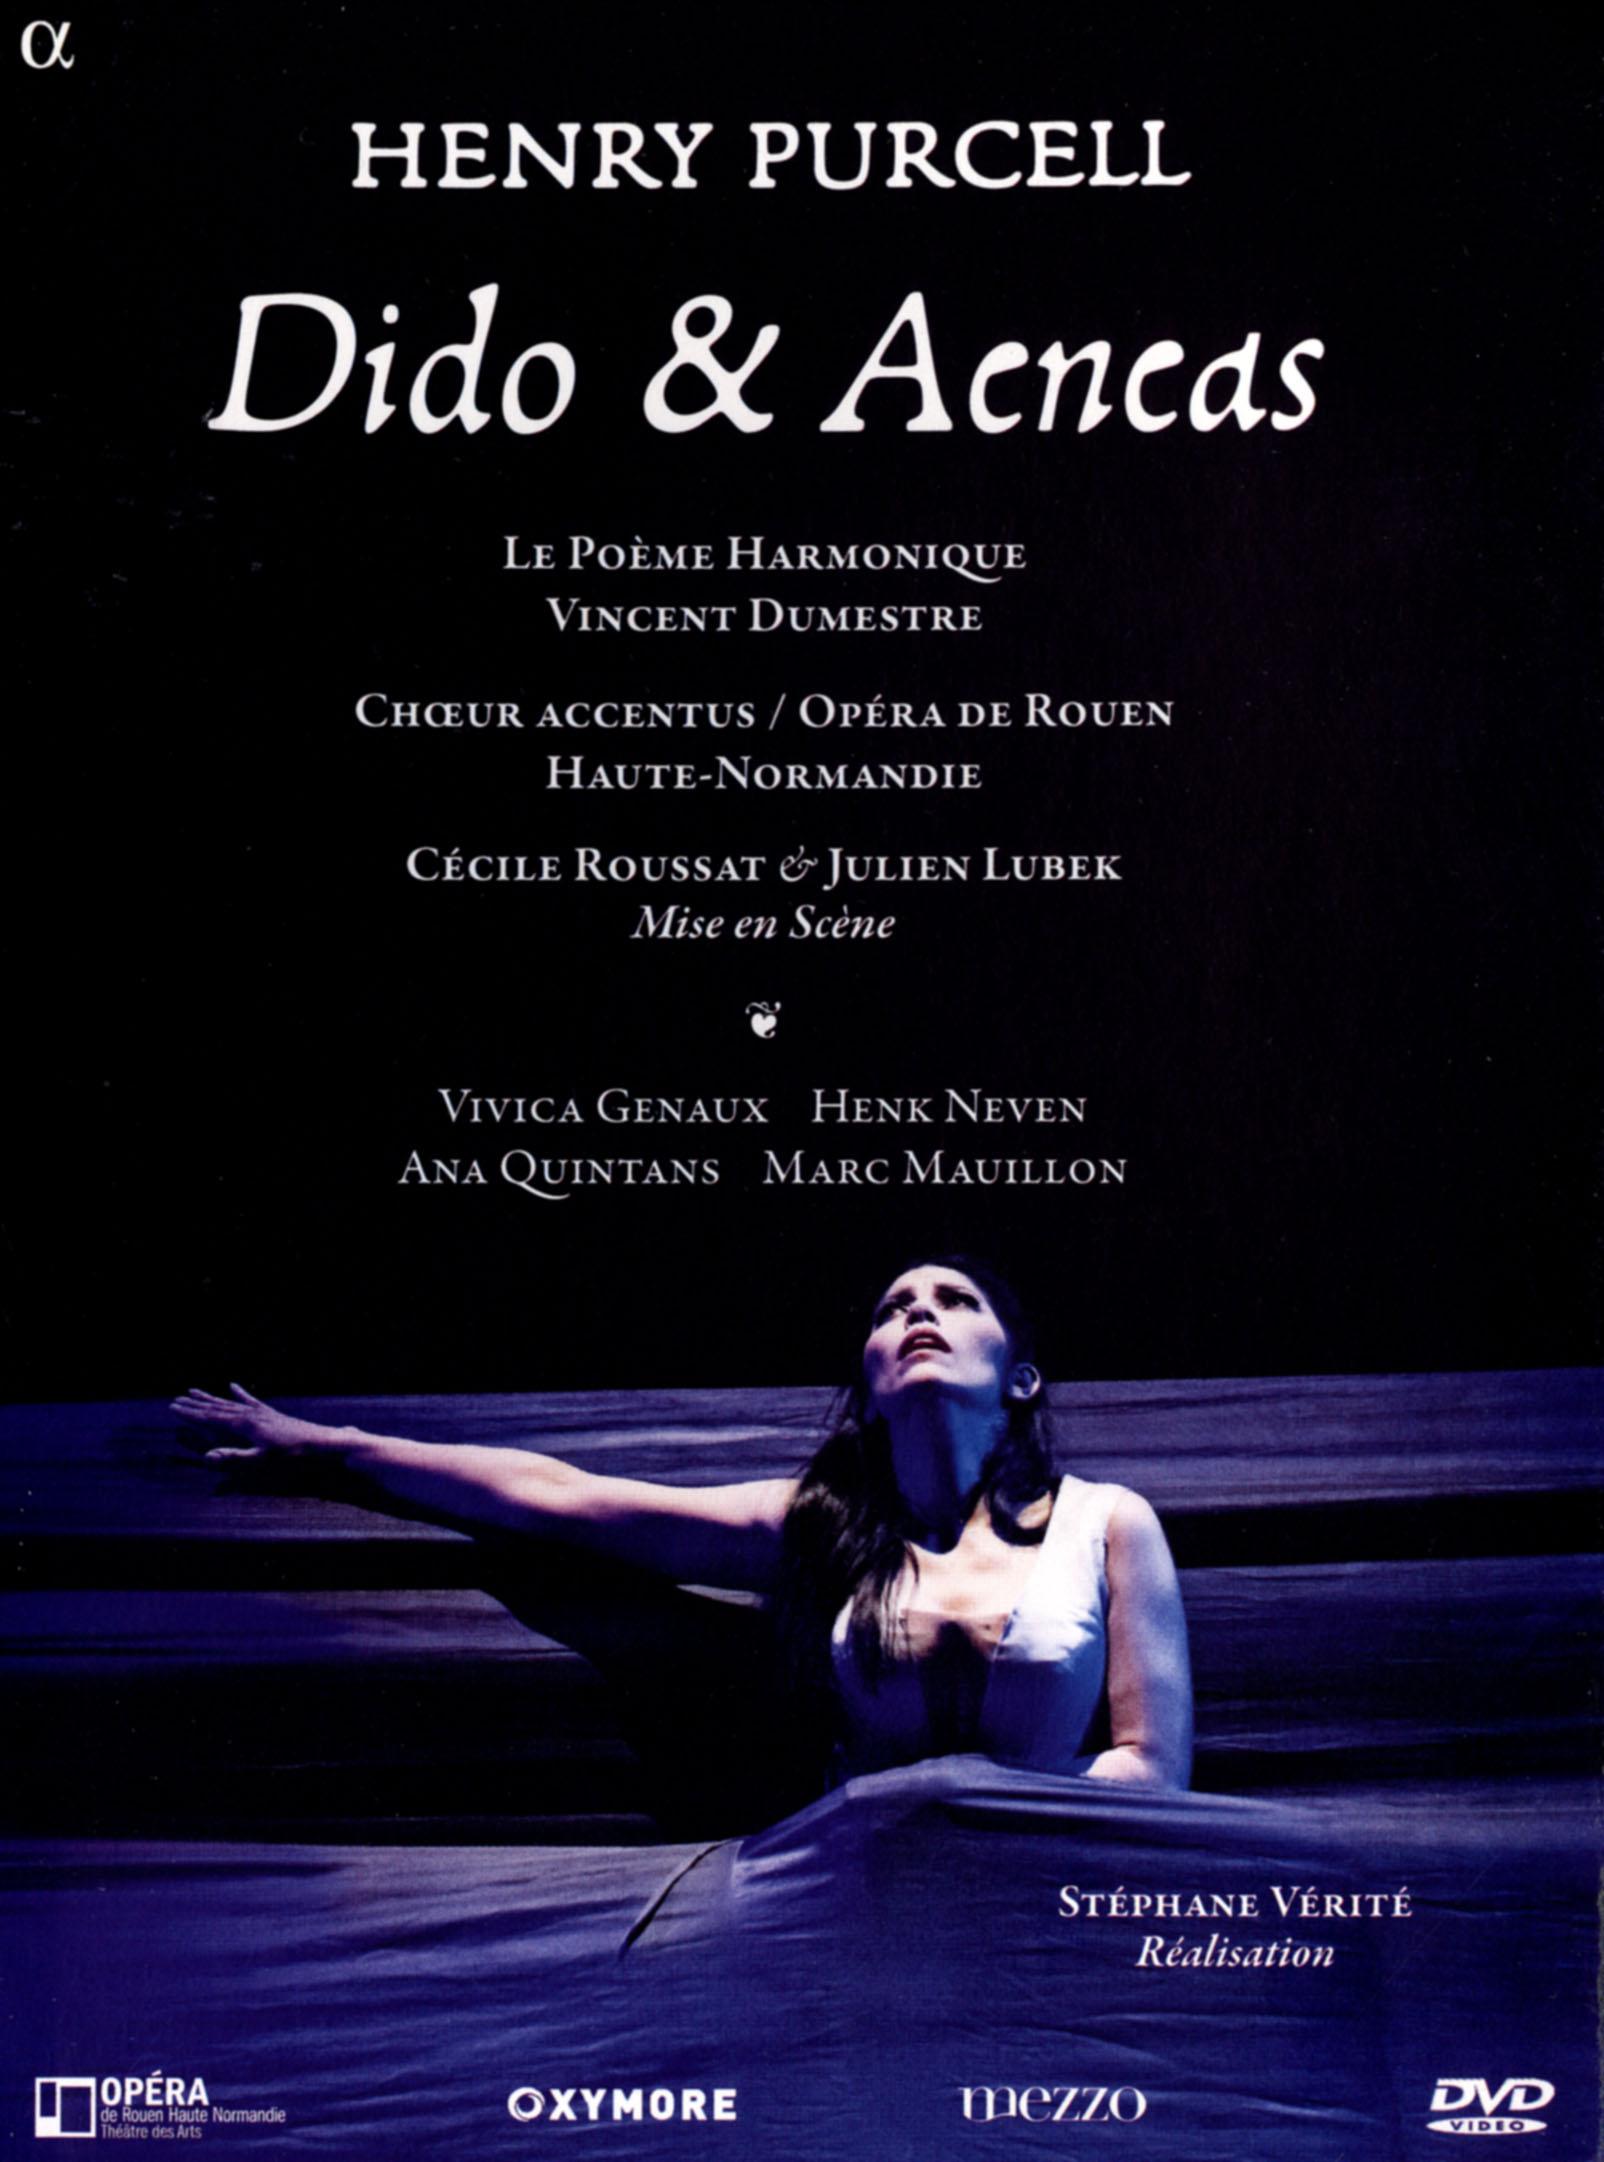 Dido and Aeneas (Opera de Rouen Haute Normandie)